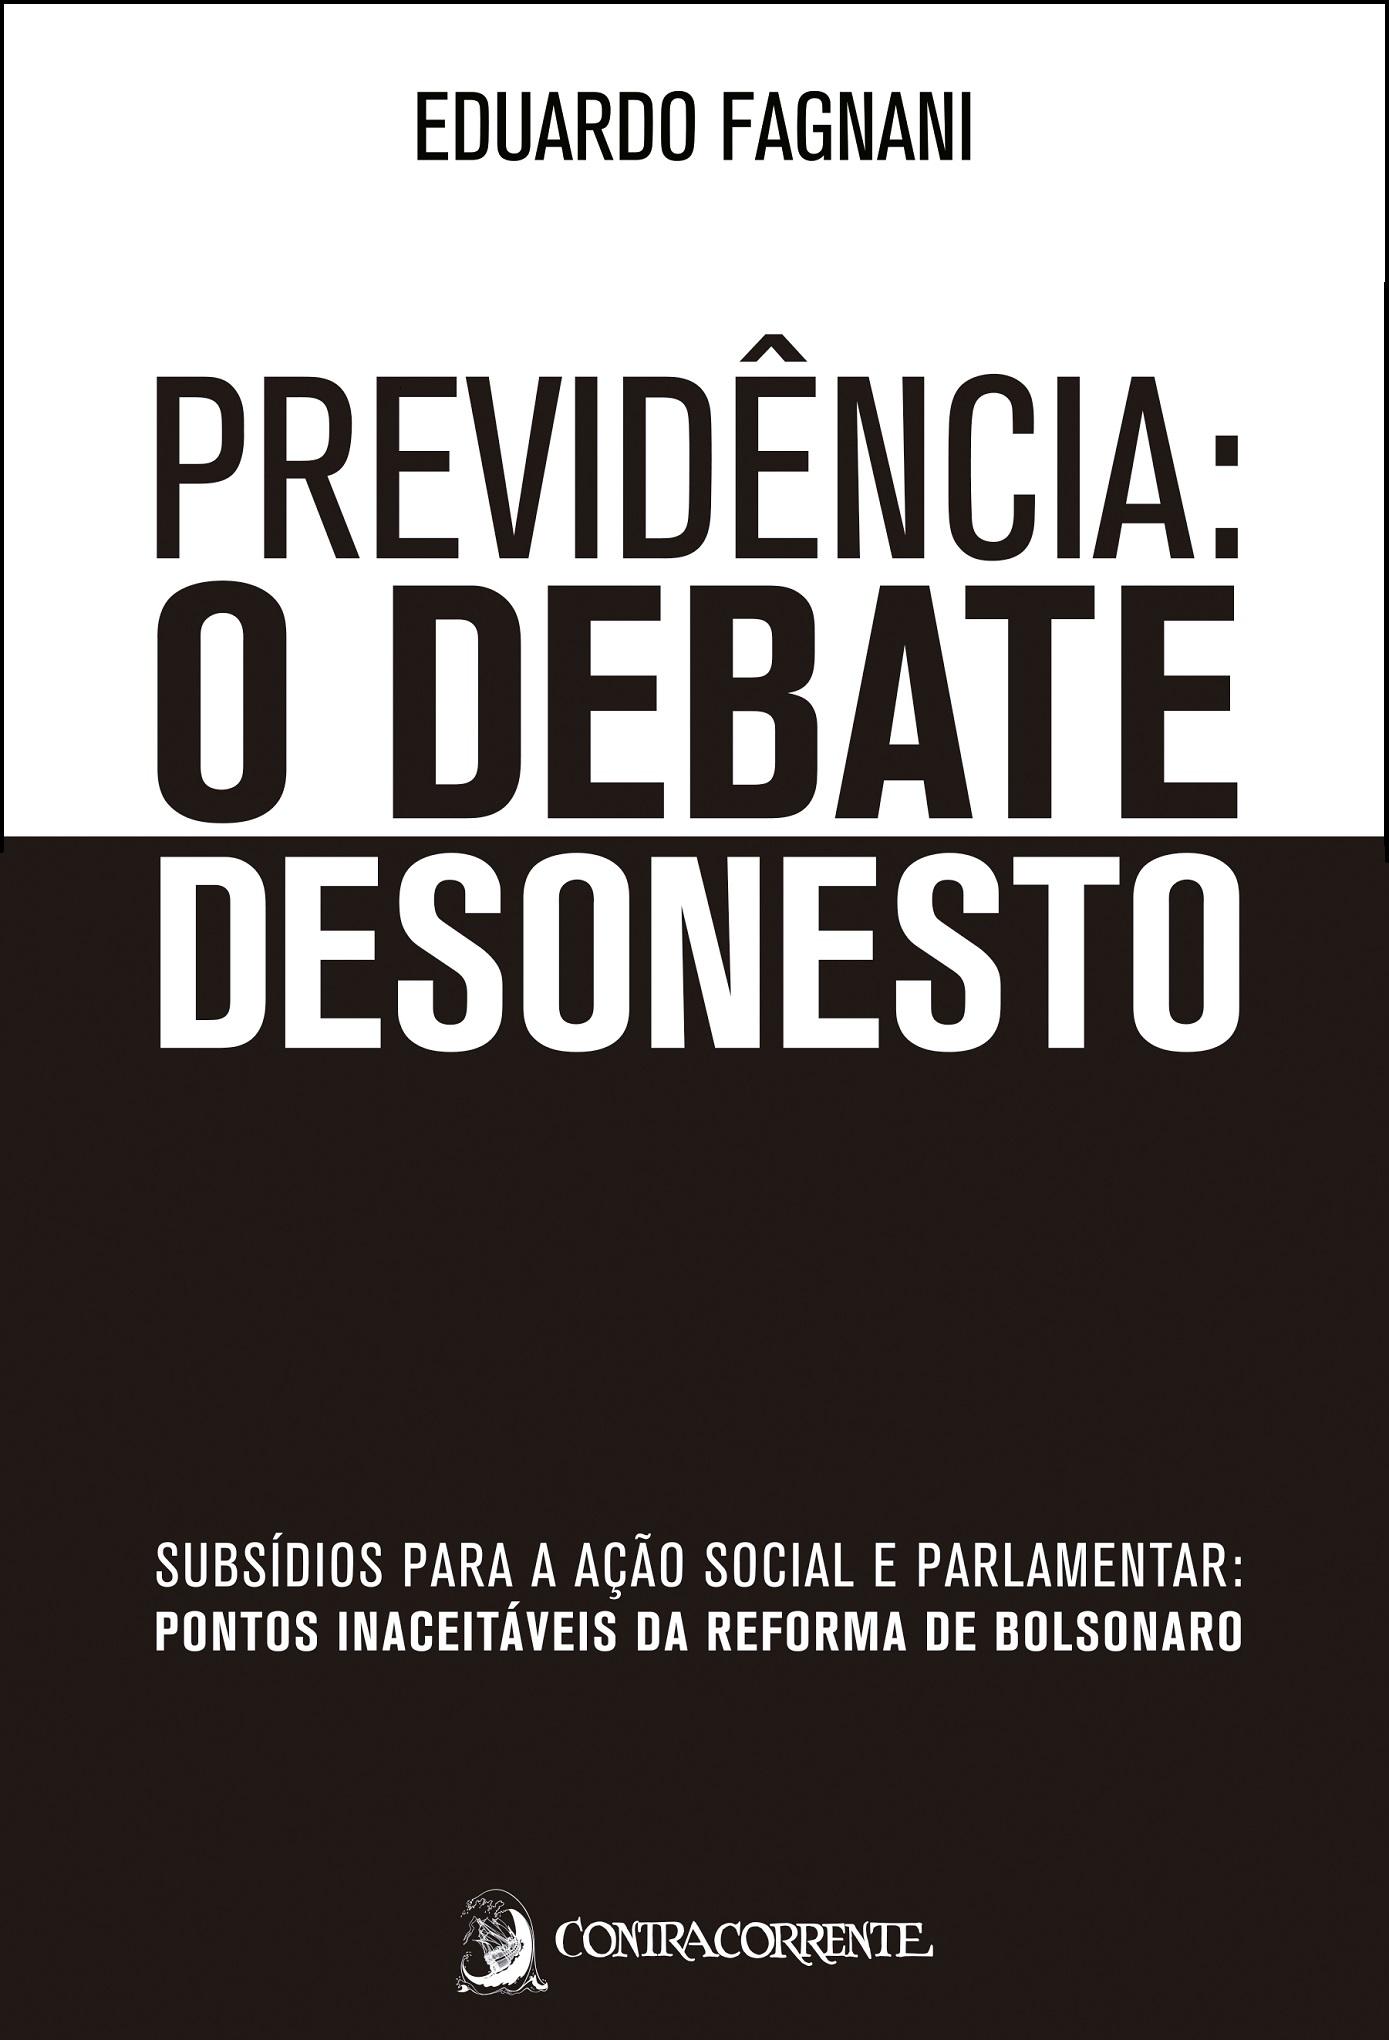 Previdência: o debate desonesto, livro de Eduardo Fagnani